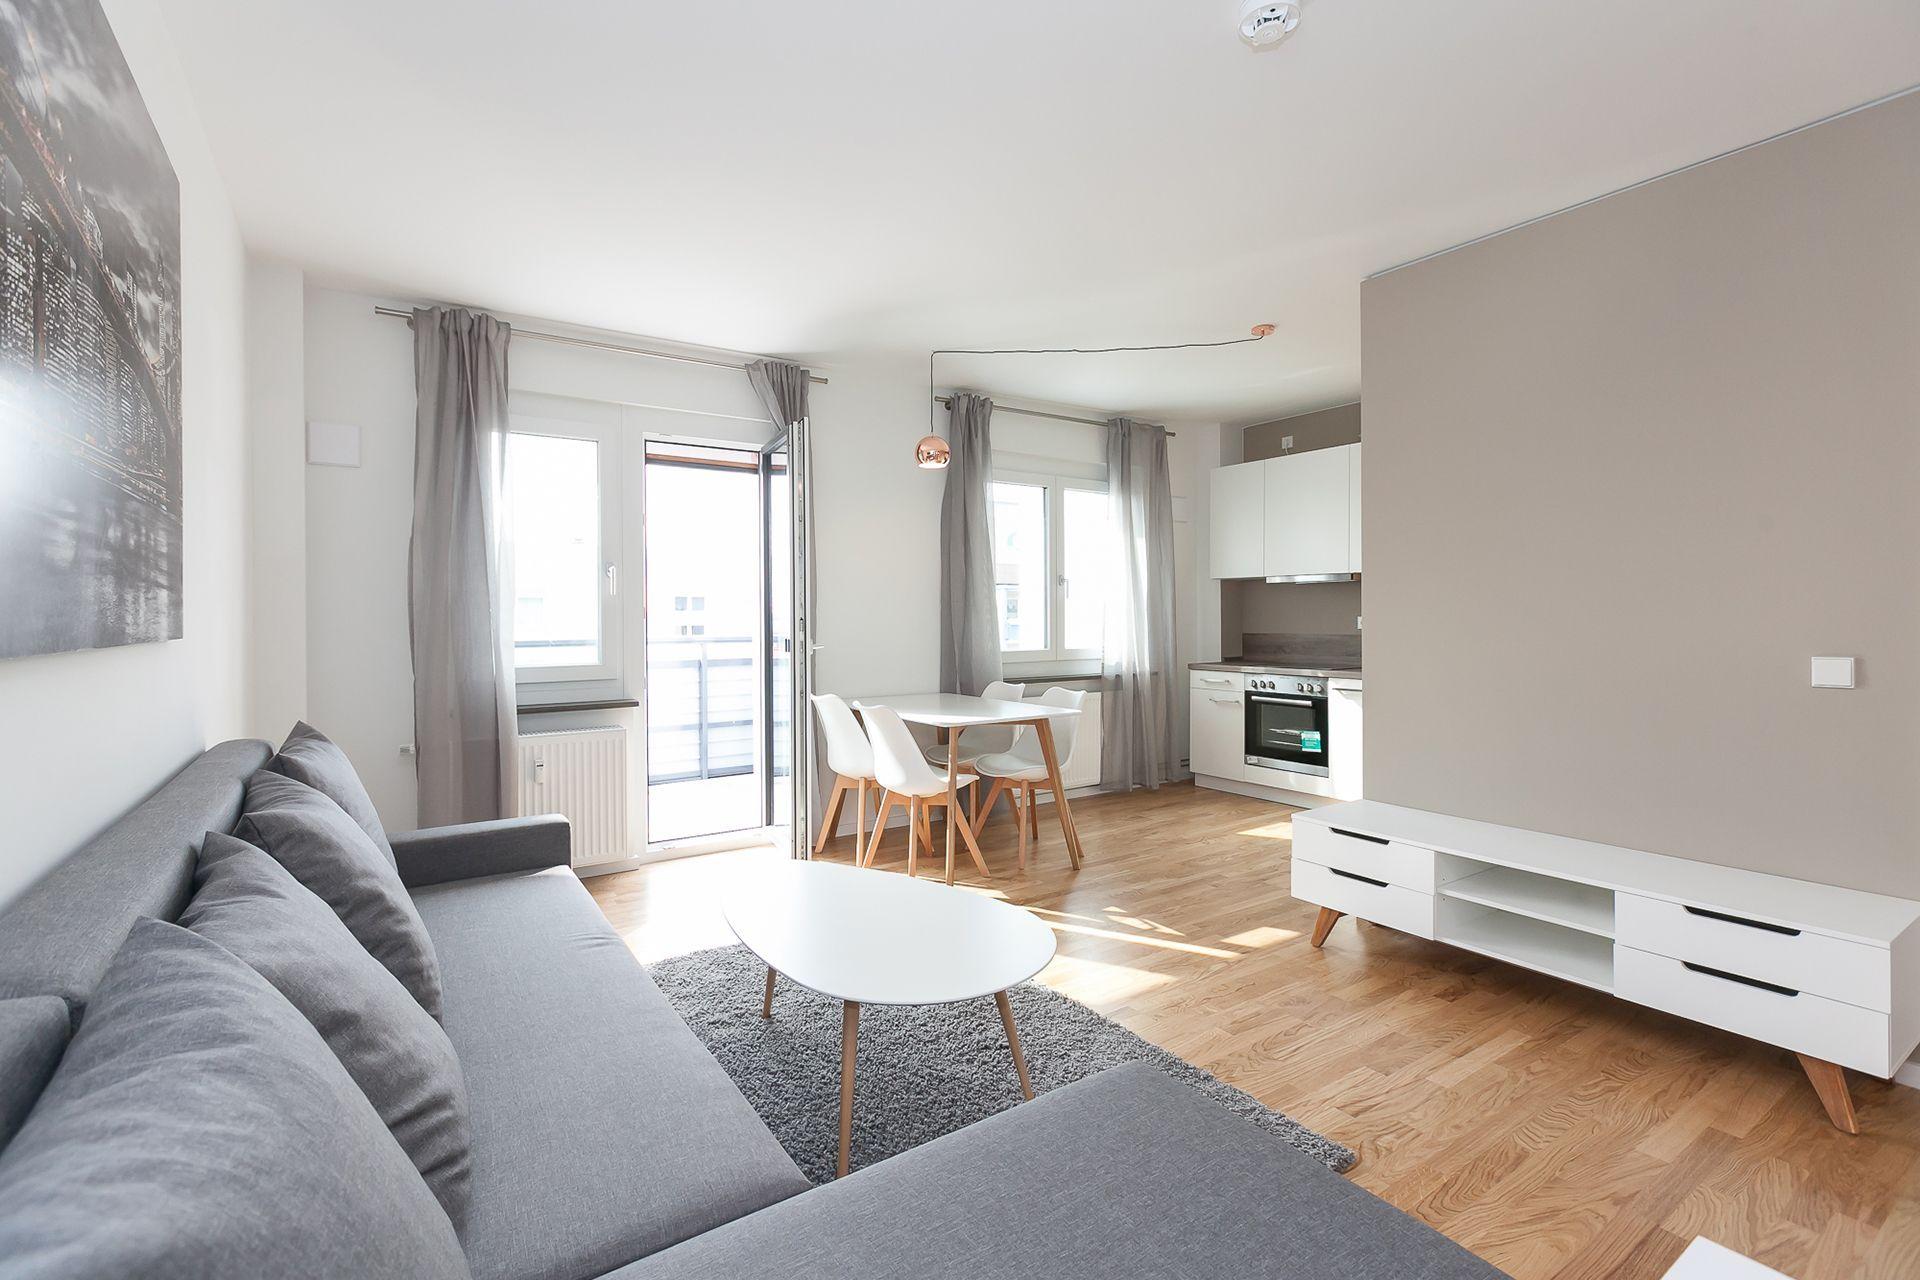 2 Bedroom - Medium apartment to rent in Berlin KOEP-KOEP-0307-0